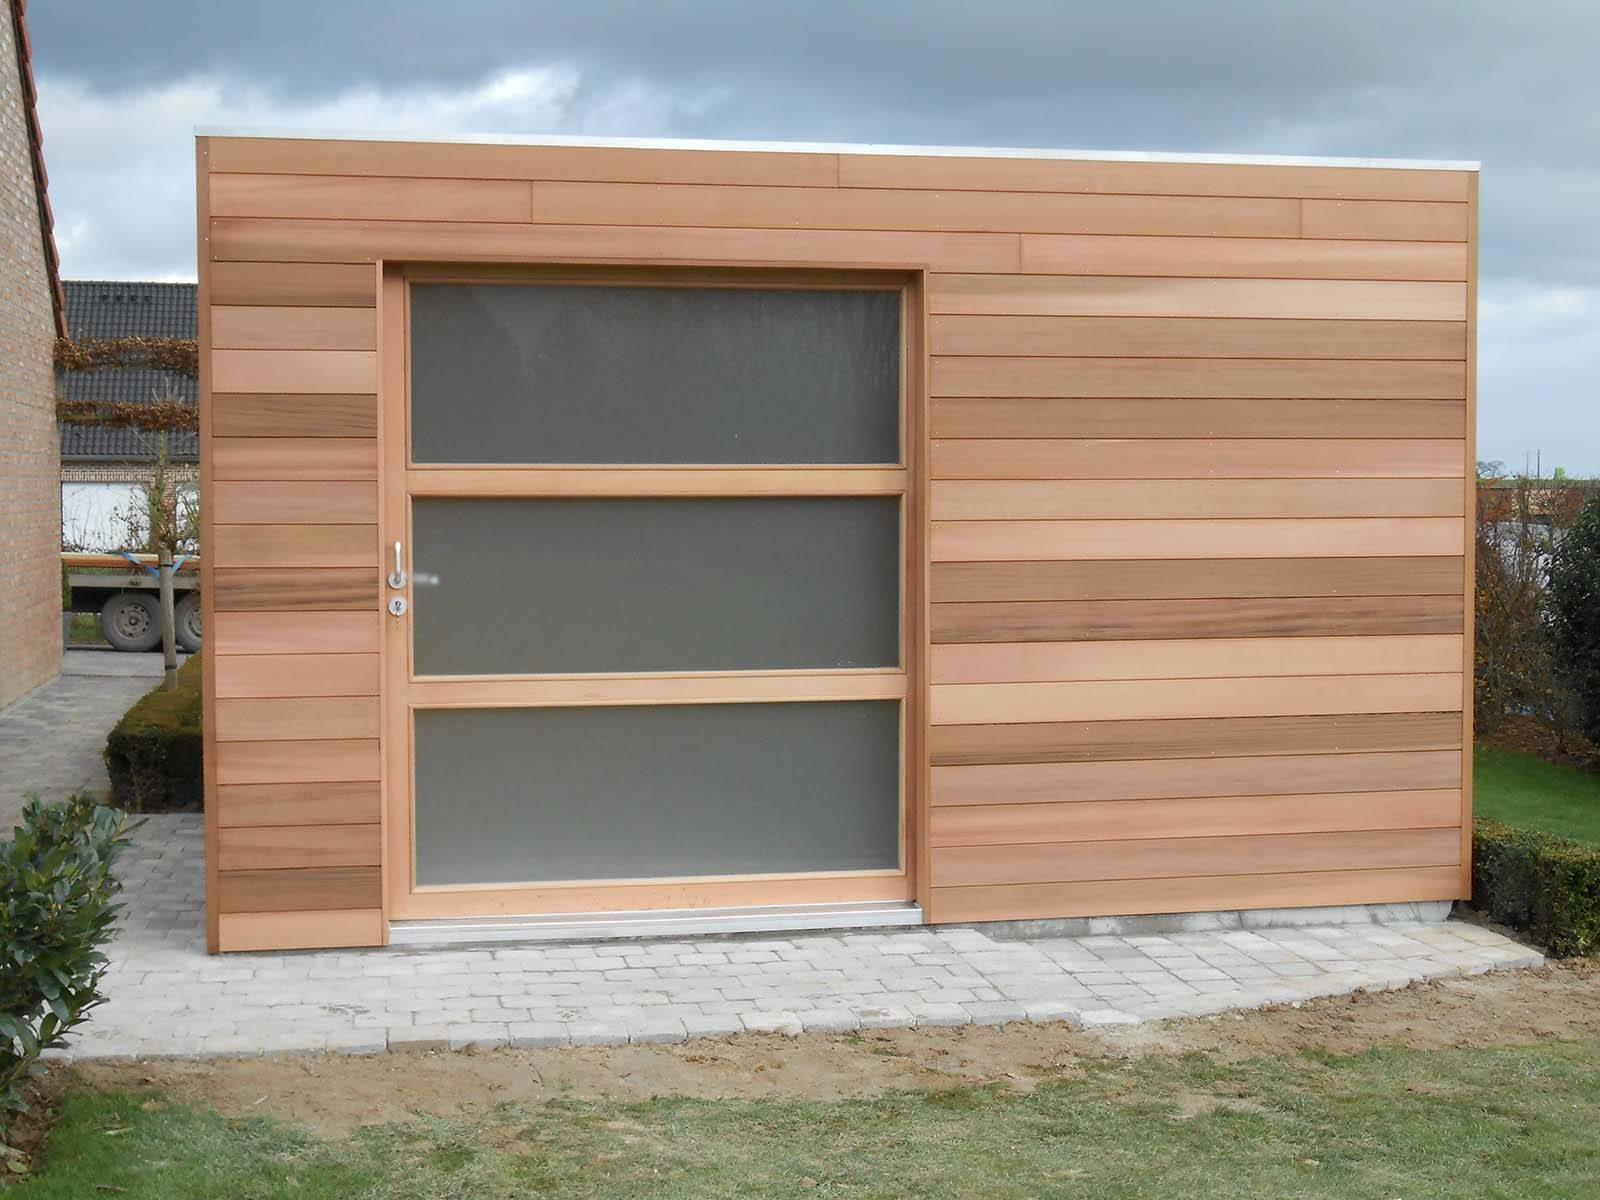 fabricant abri de jardin moderne quadro abri toit plat. Black Bedroom Furniture Sets. Home Design Ideas